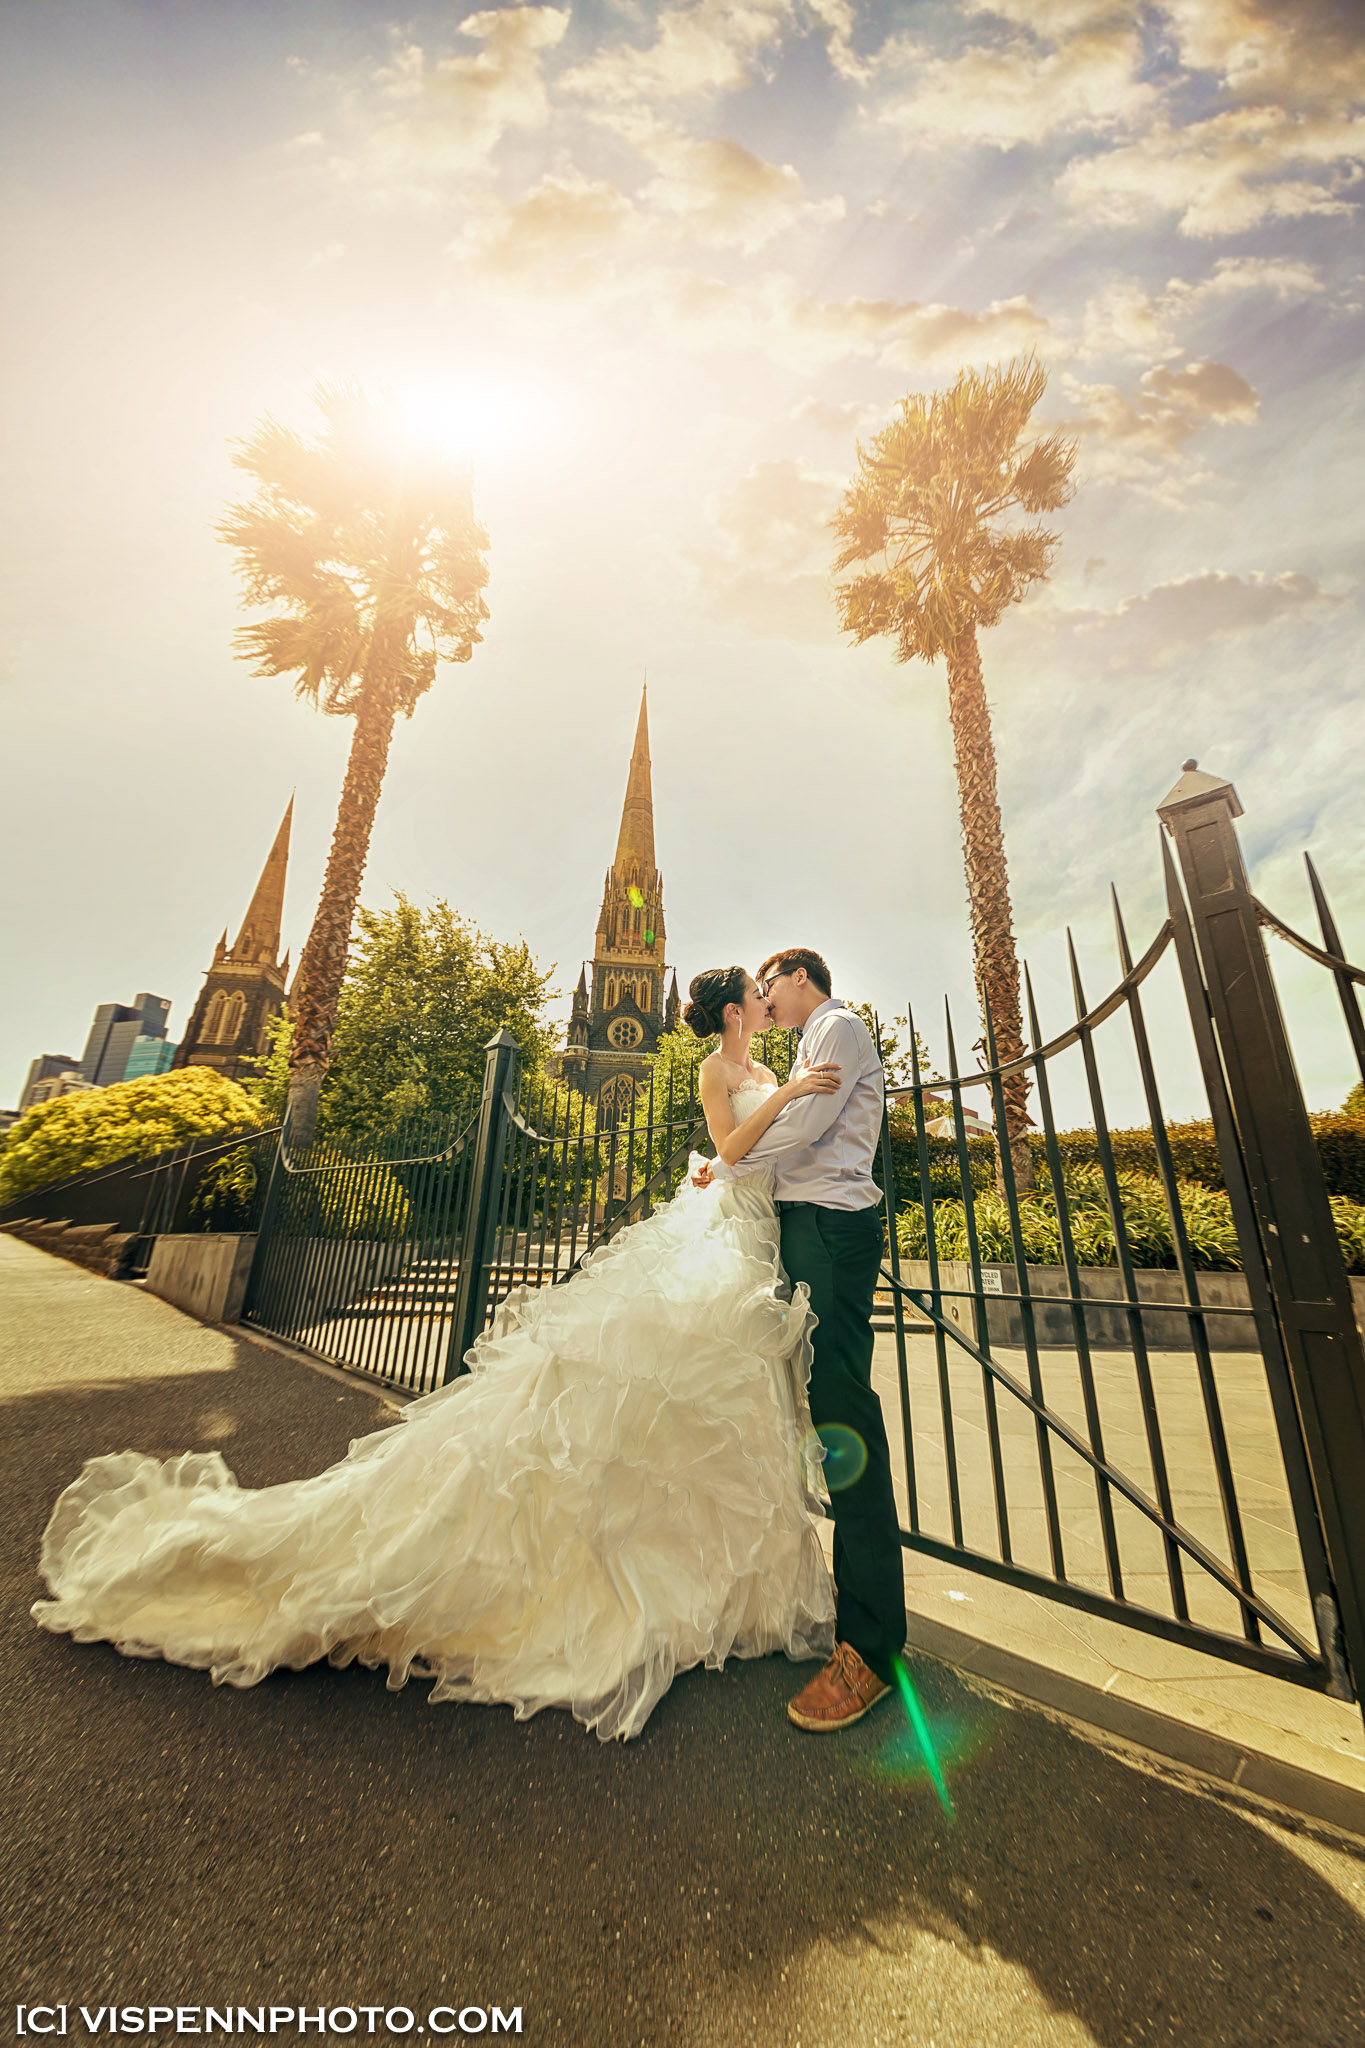 PRE WEDDING Photography Melbourne KarenCai 3362 1